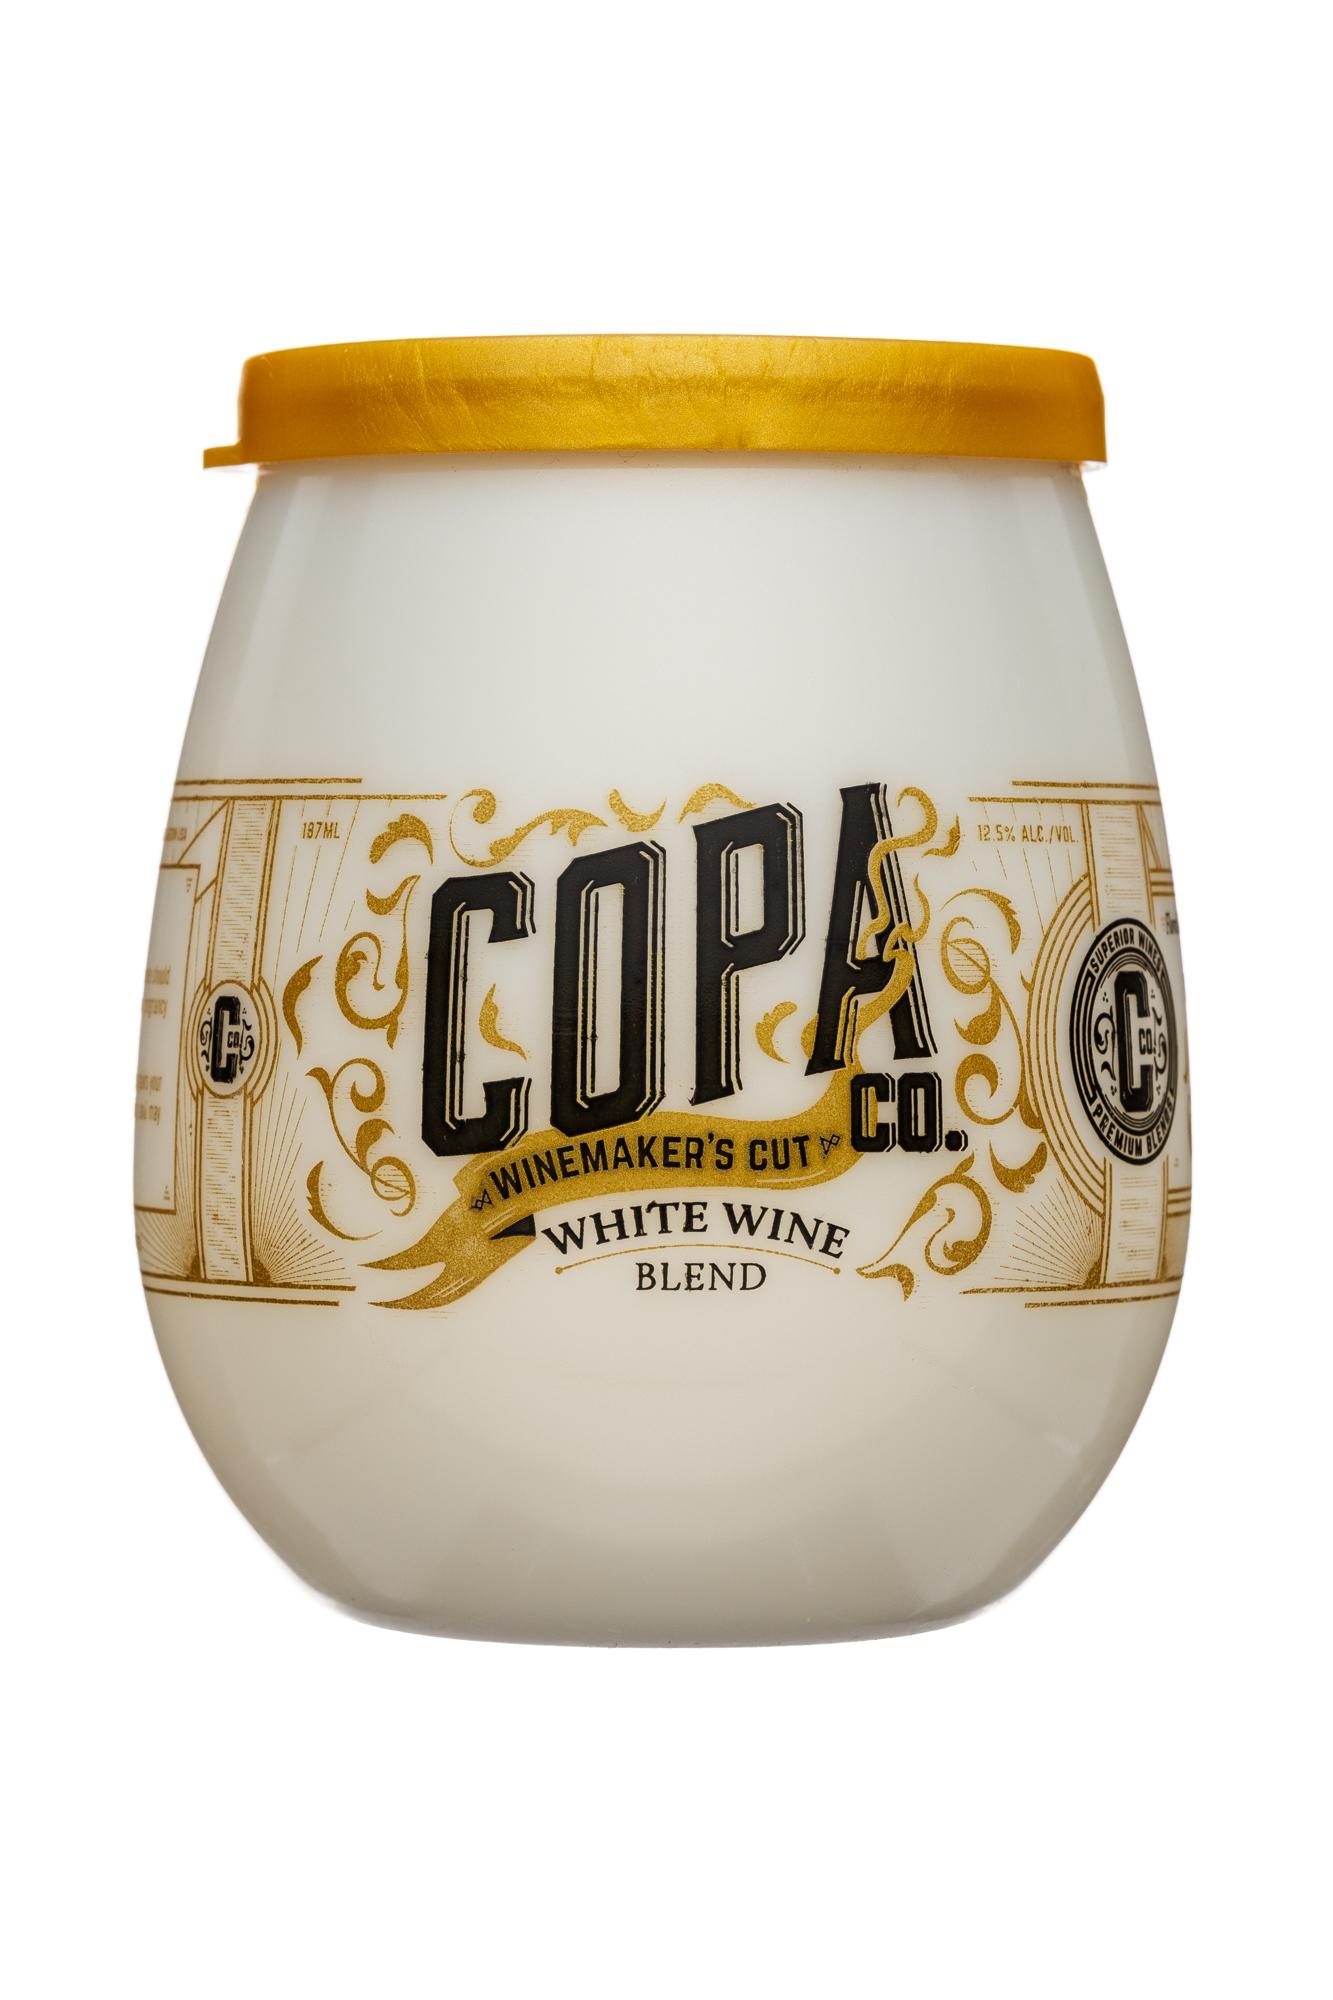 White Wine Blend